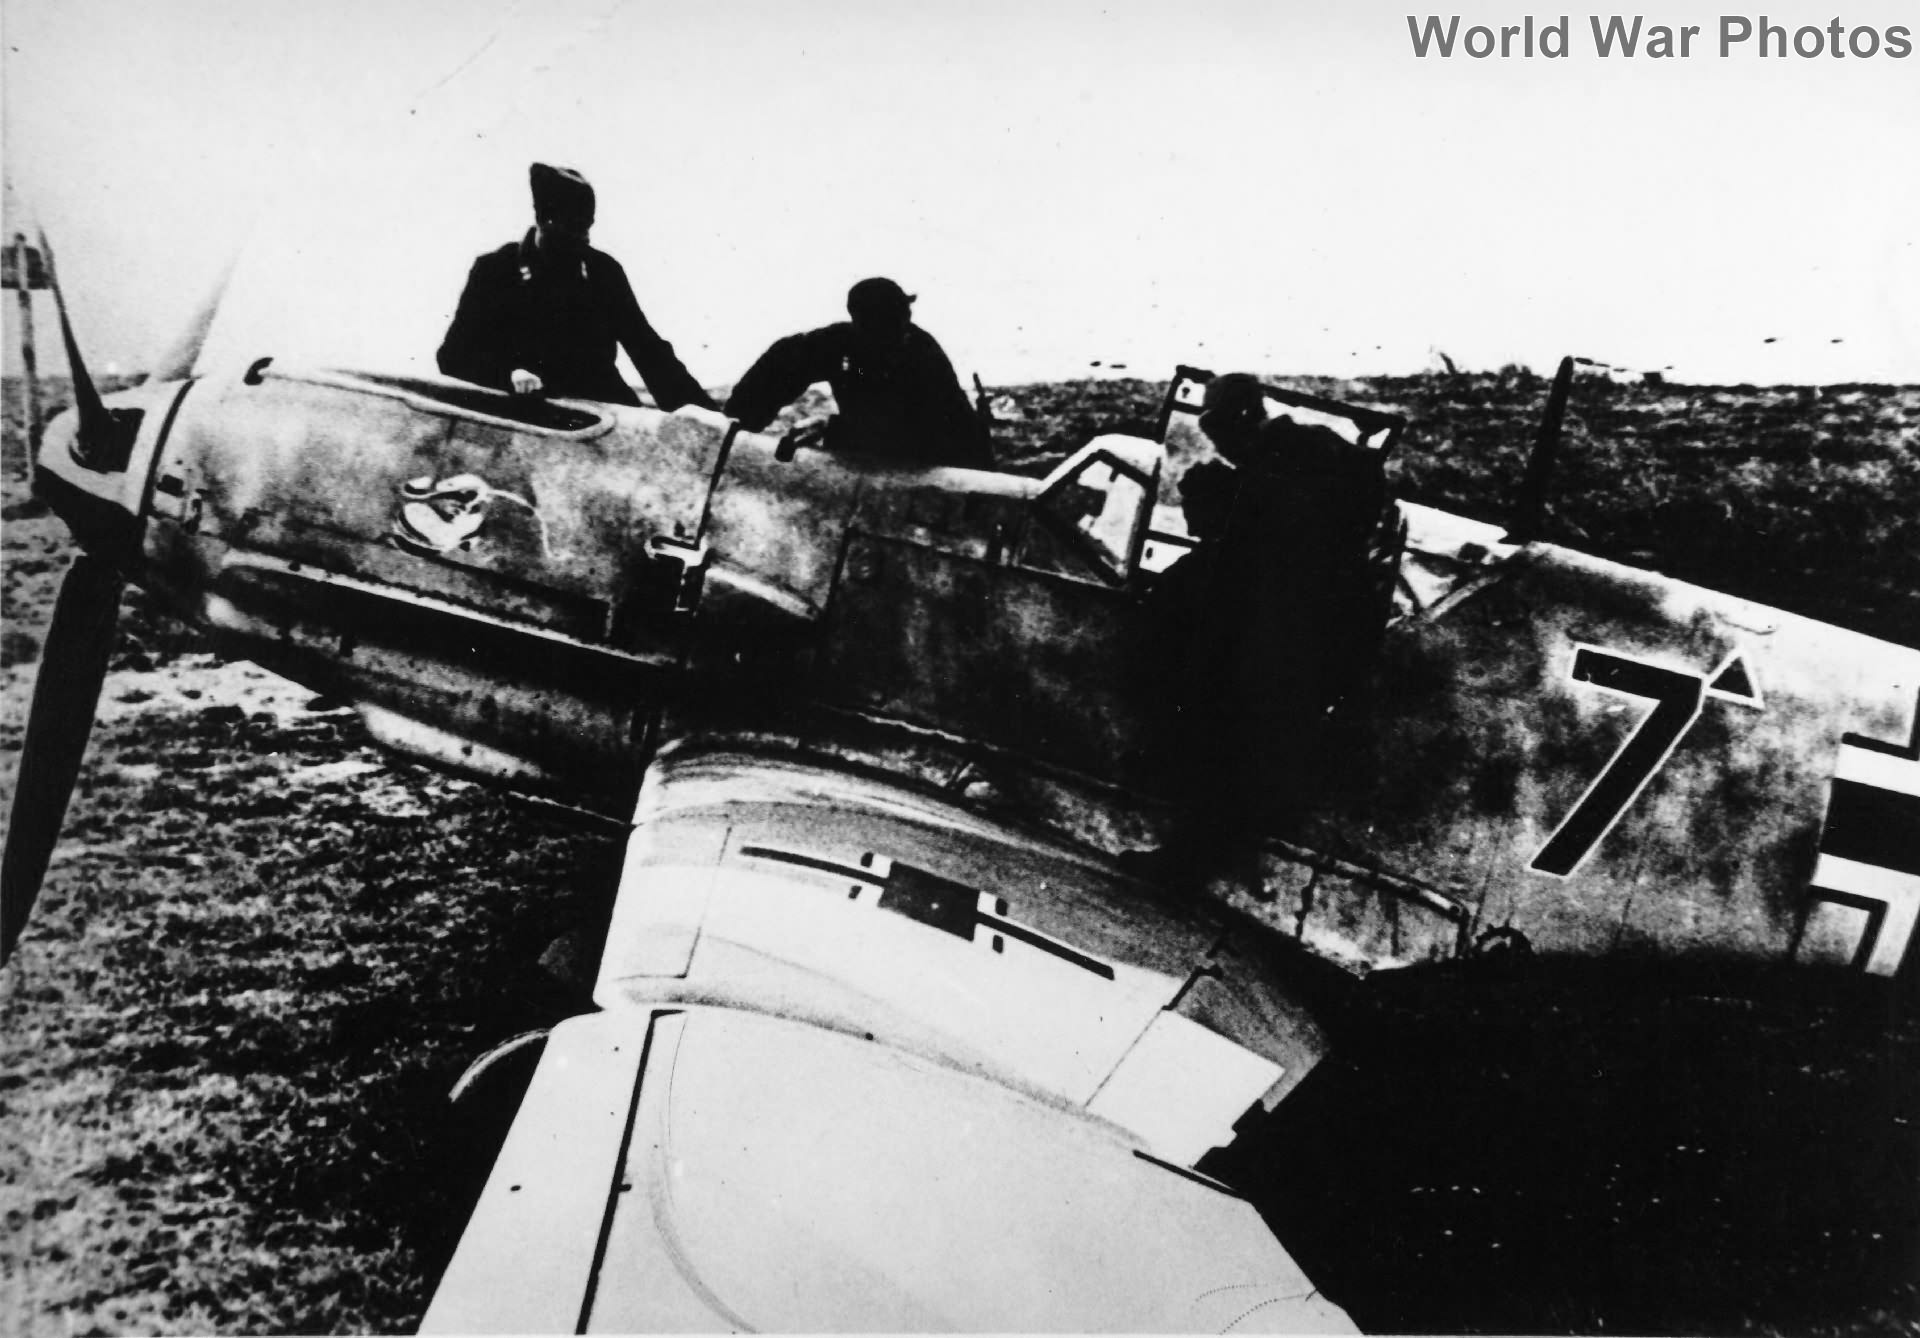 Bf109E 7 of IV/JG51